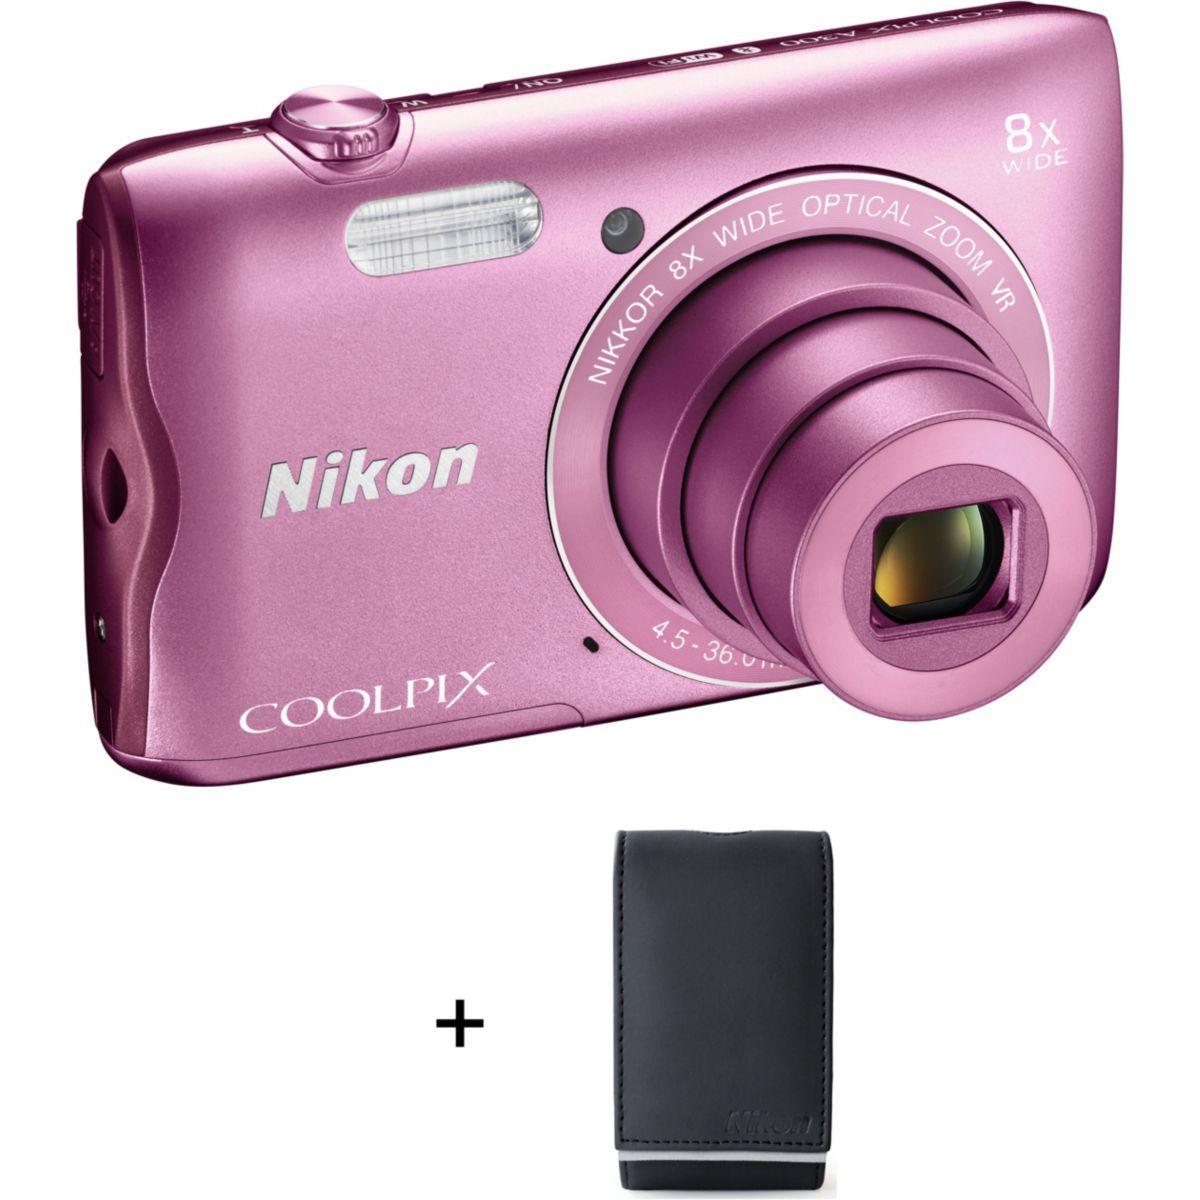 Appareil photo compact nikon a300 rose + etui (photo)